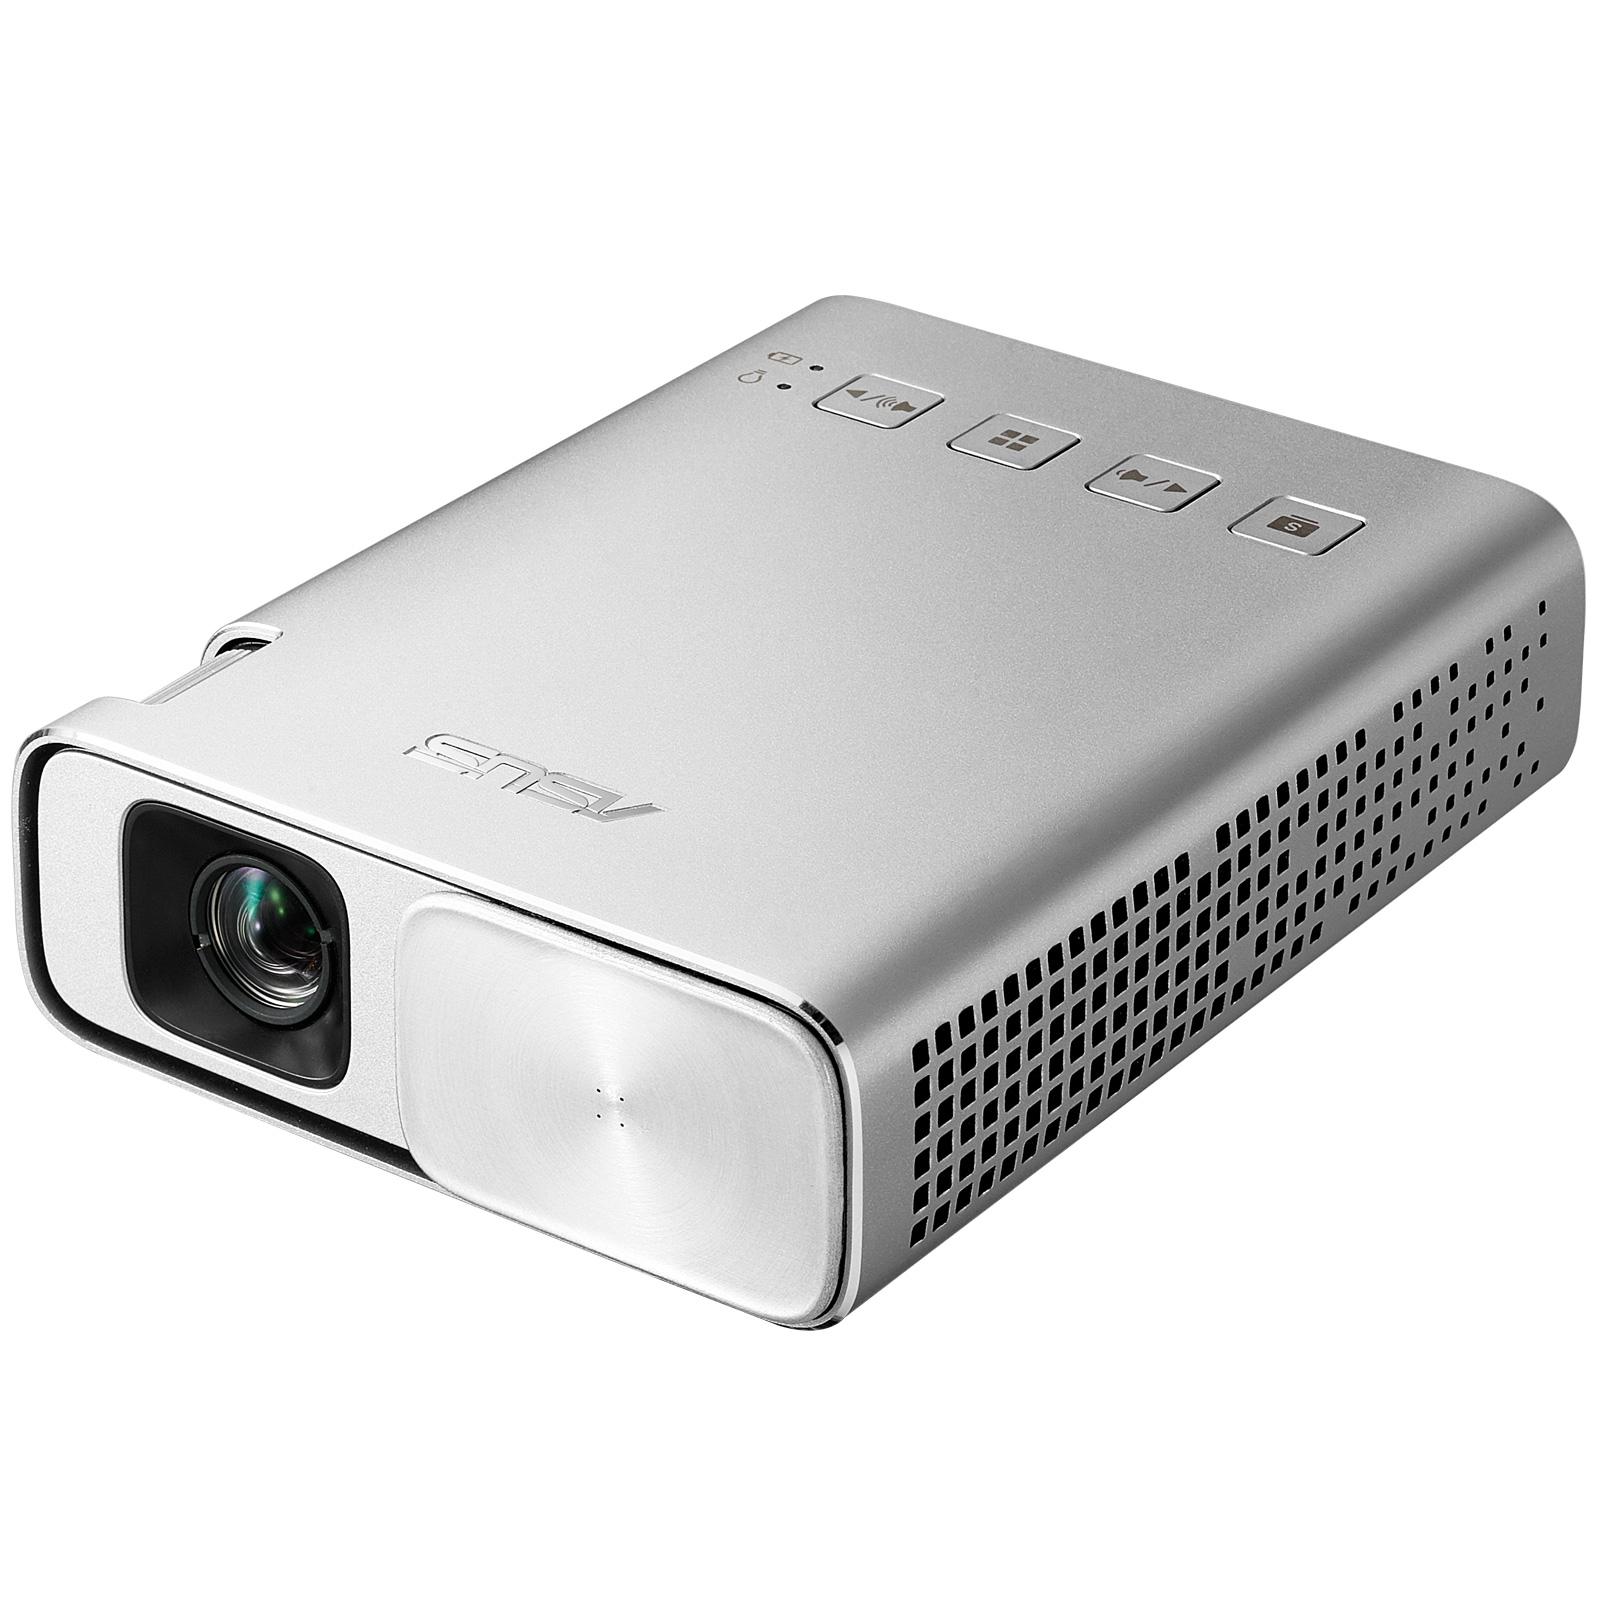 ASUS ZenBeam E1 150ANSI lumens DLP WVGA (854x480) Portable projector Silver